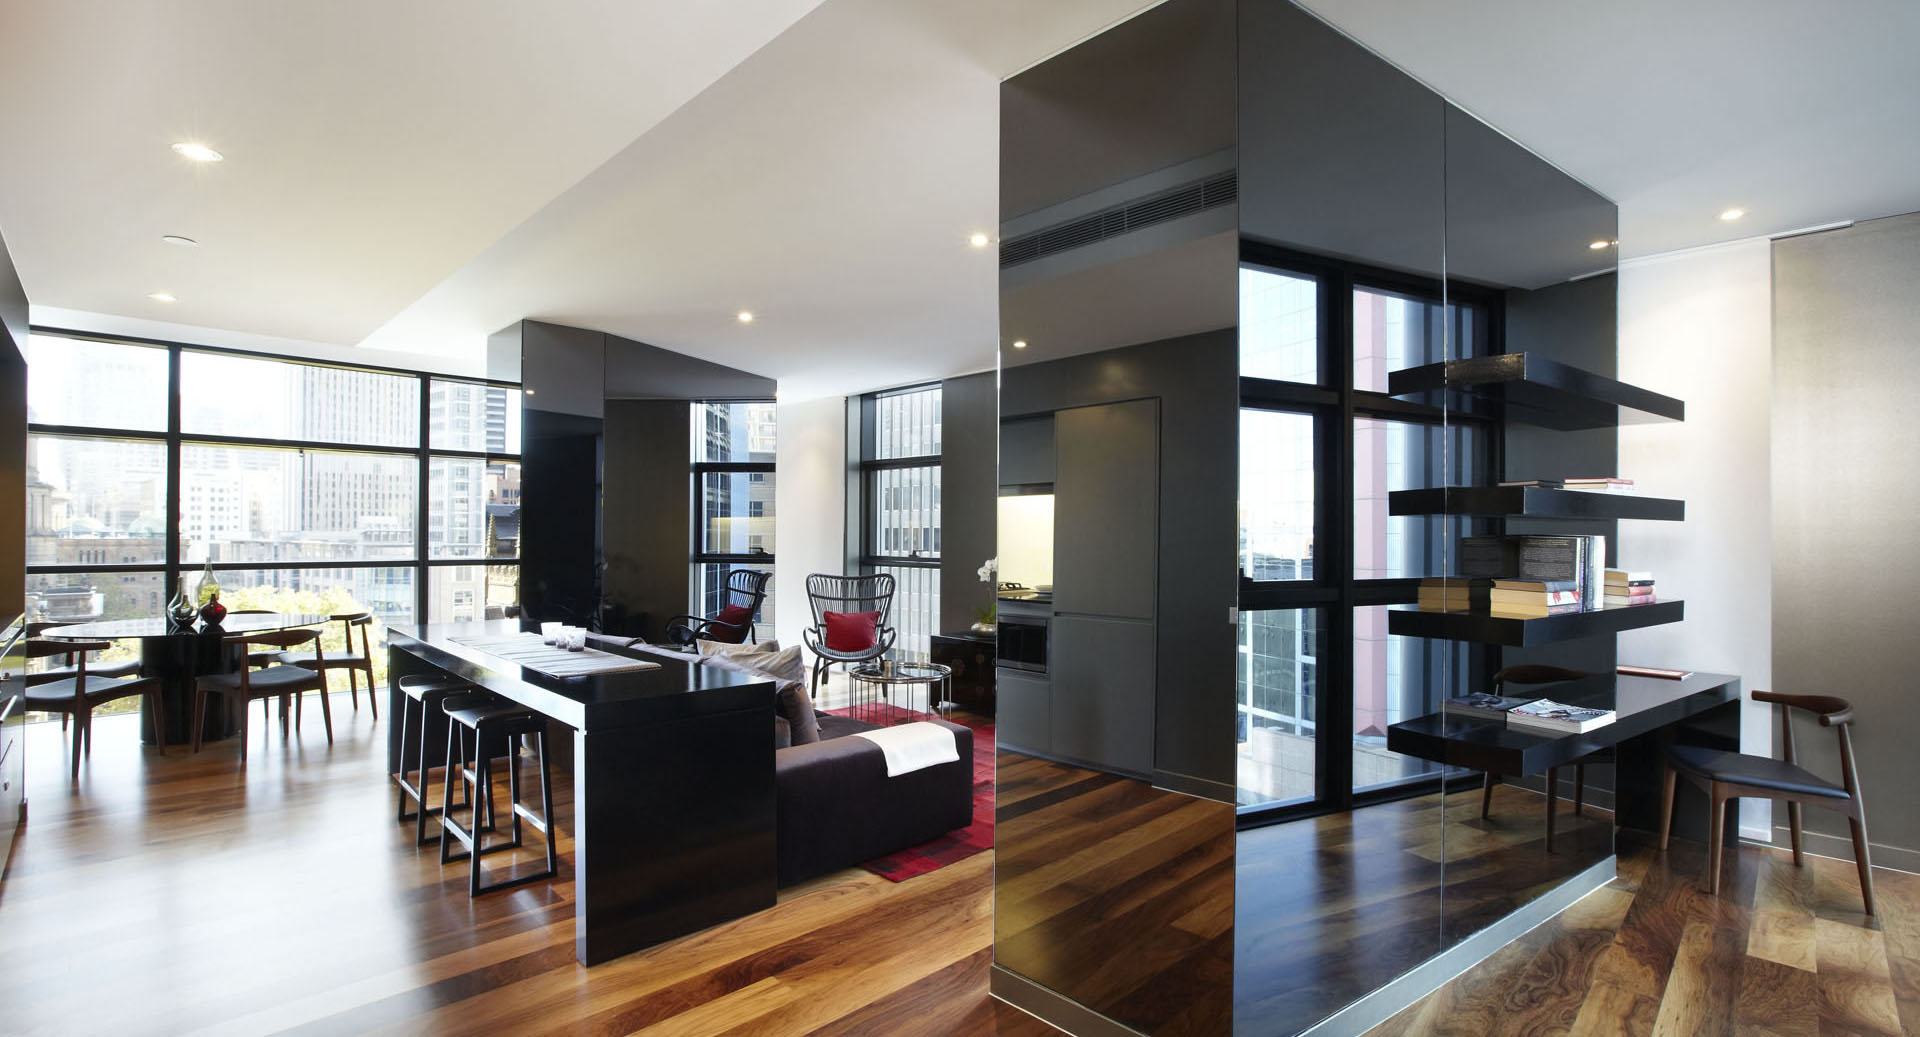 Contemporary Apartment Designs In Sydney  iDesignArch  Interior Design Architecture